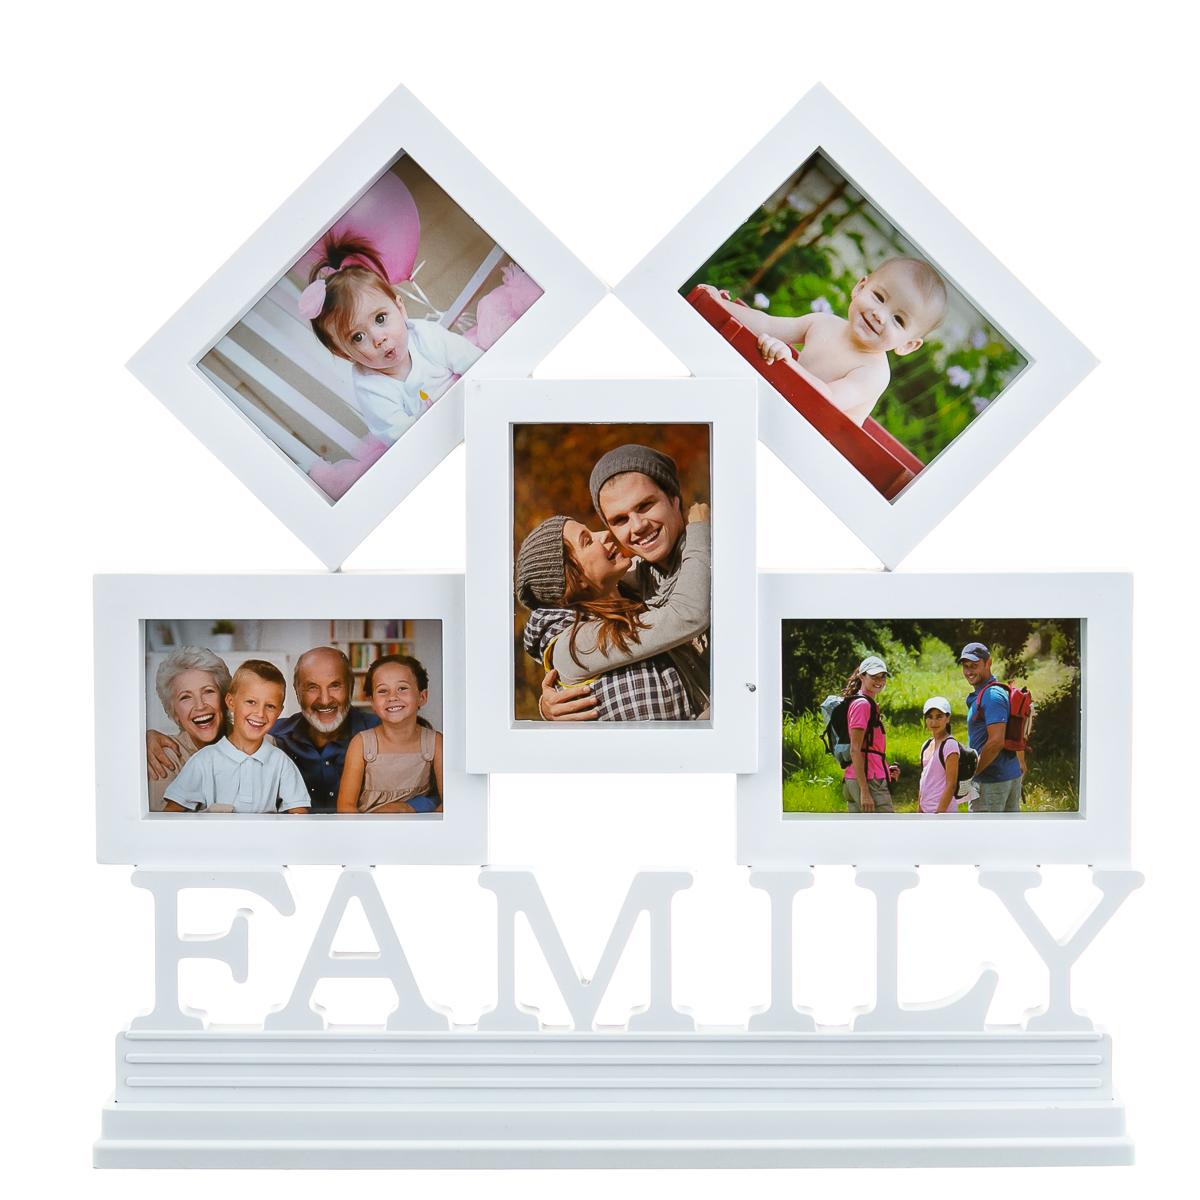 Рамка для фото Family, на 5 фото